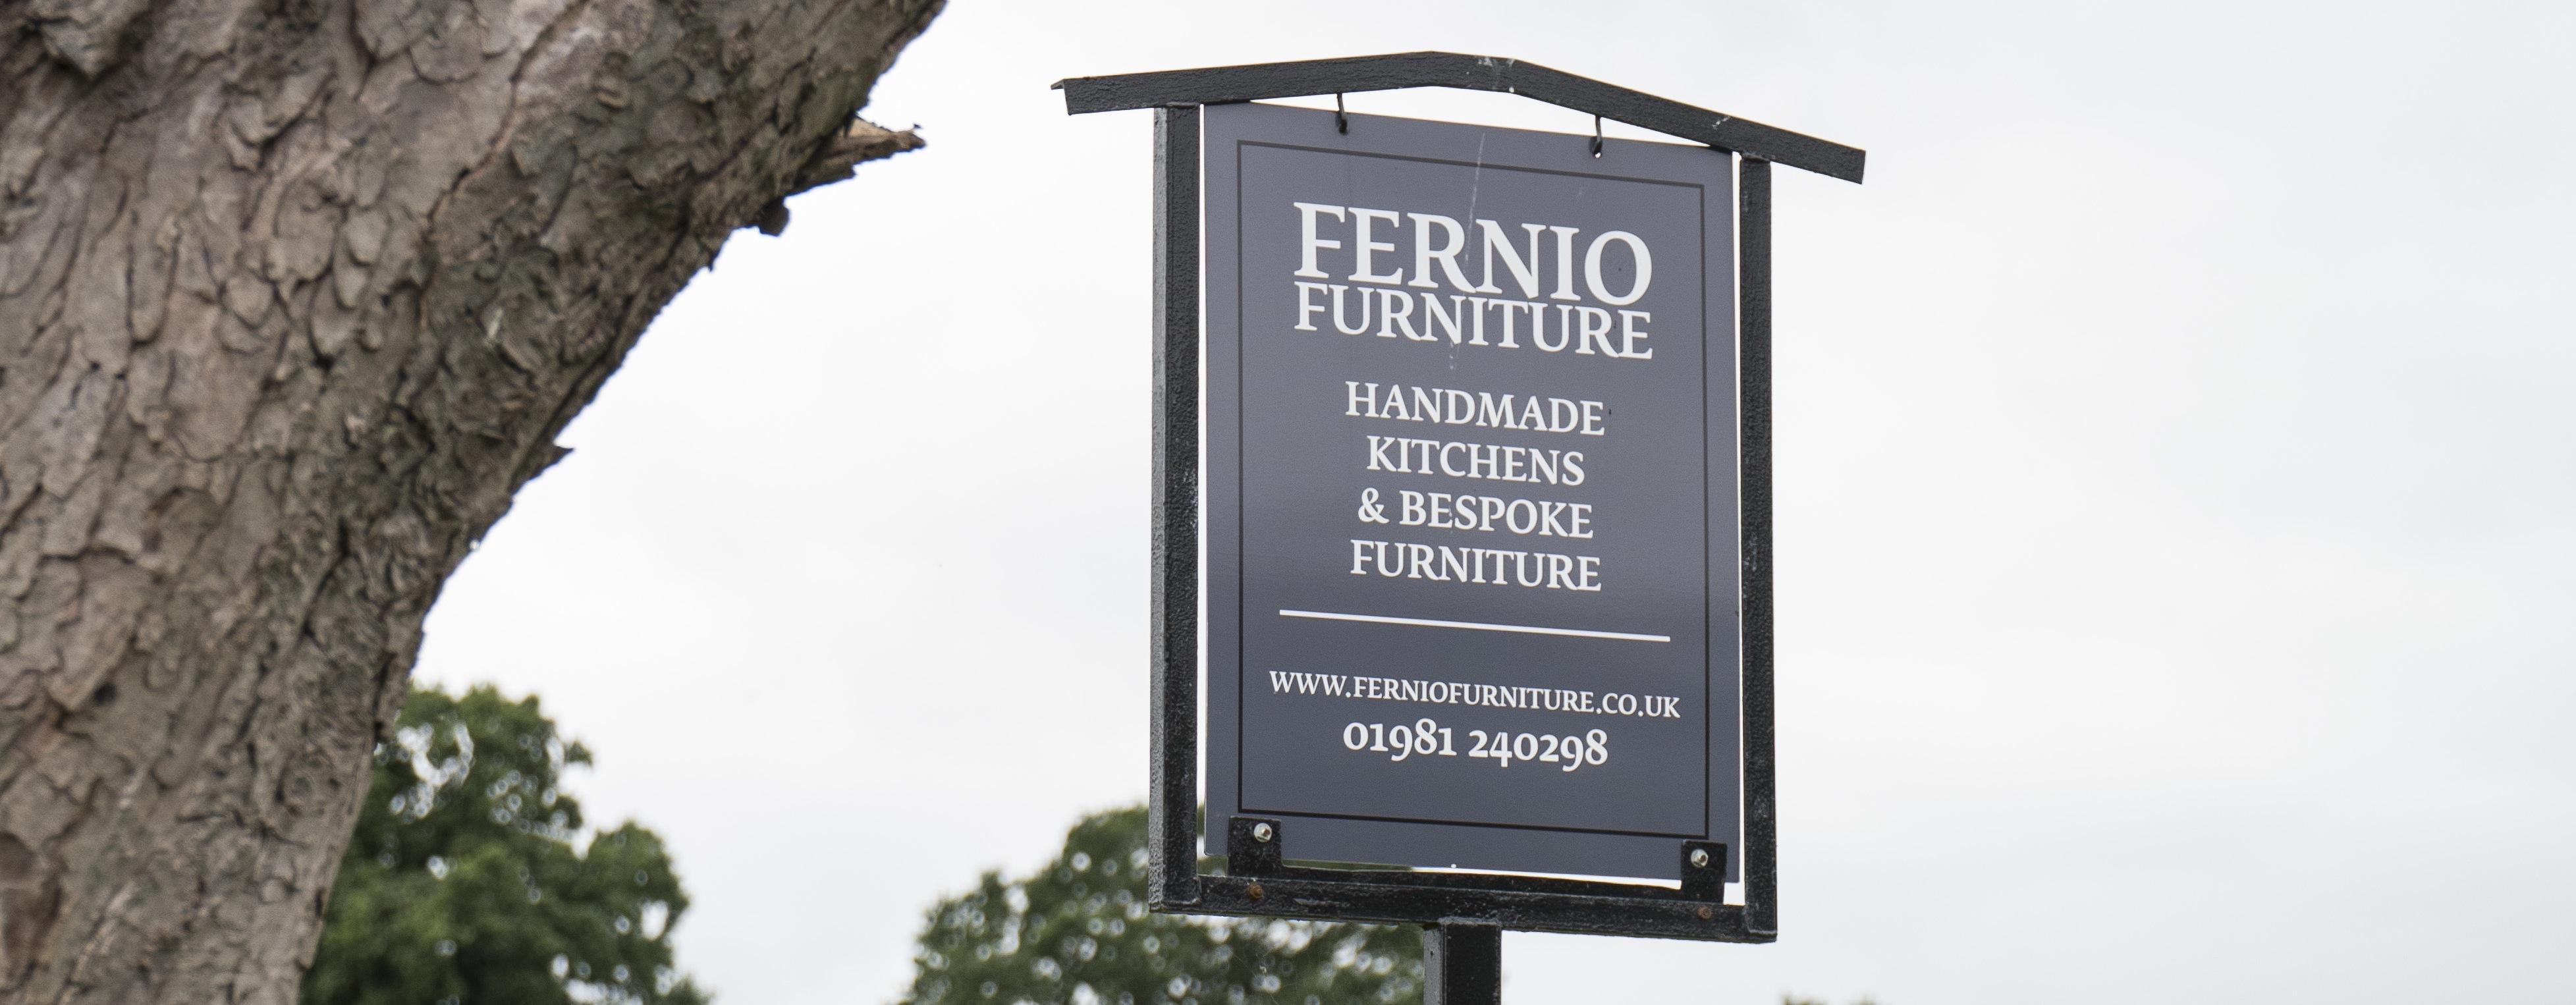 fernino 00002